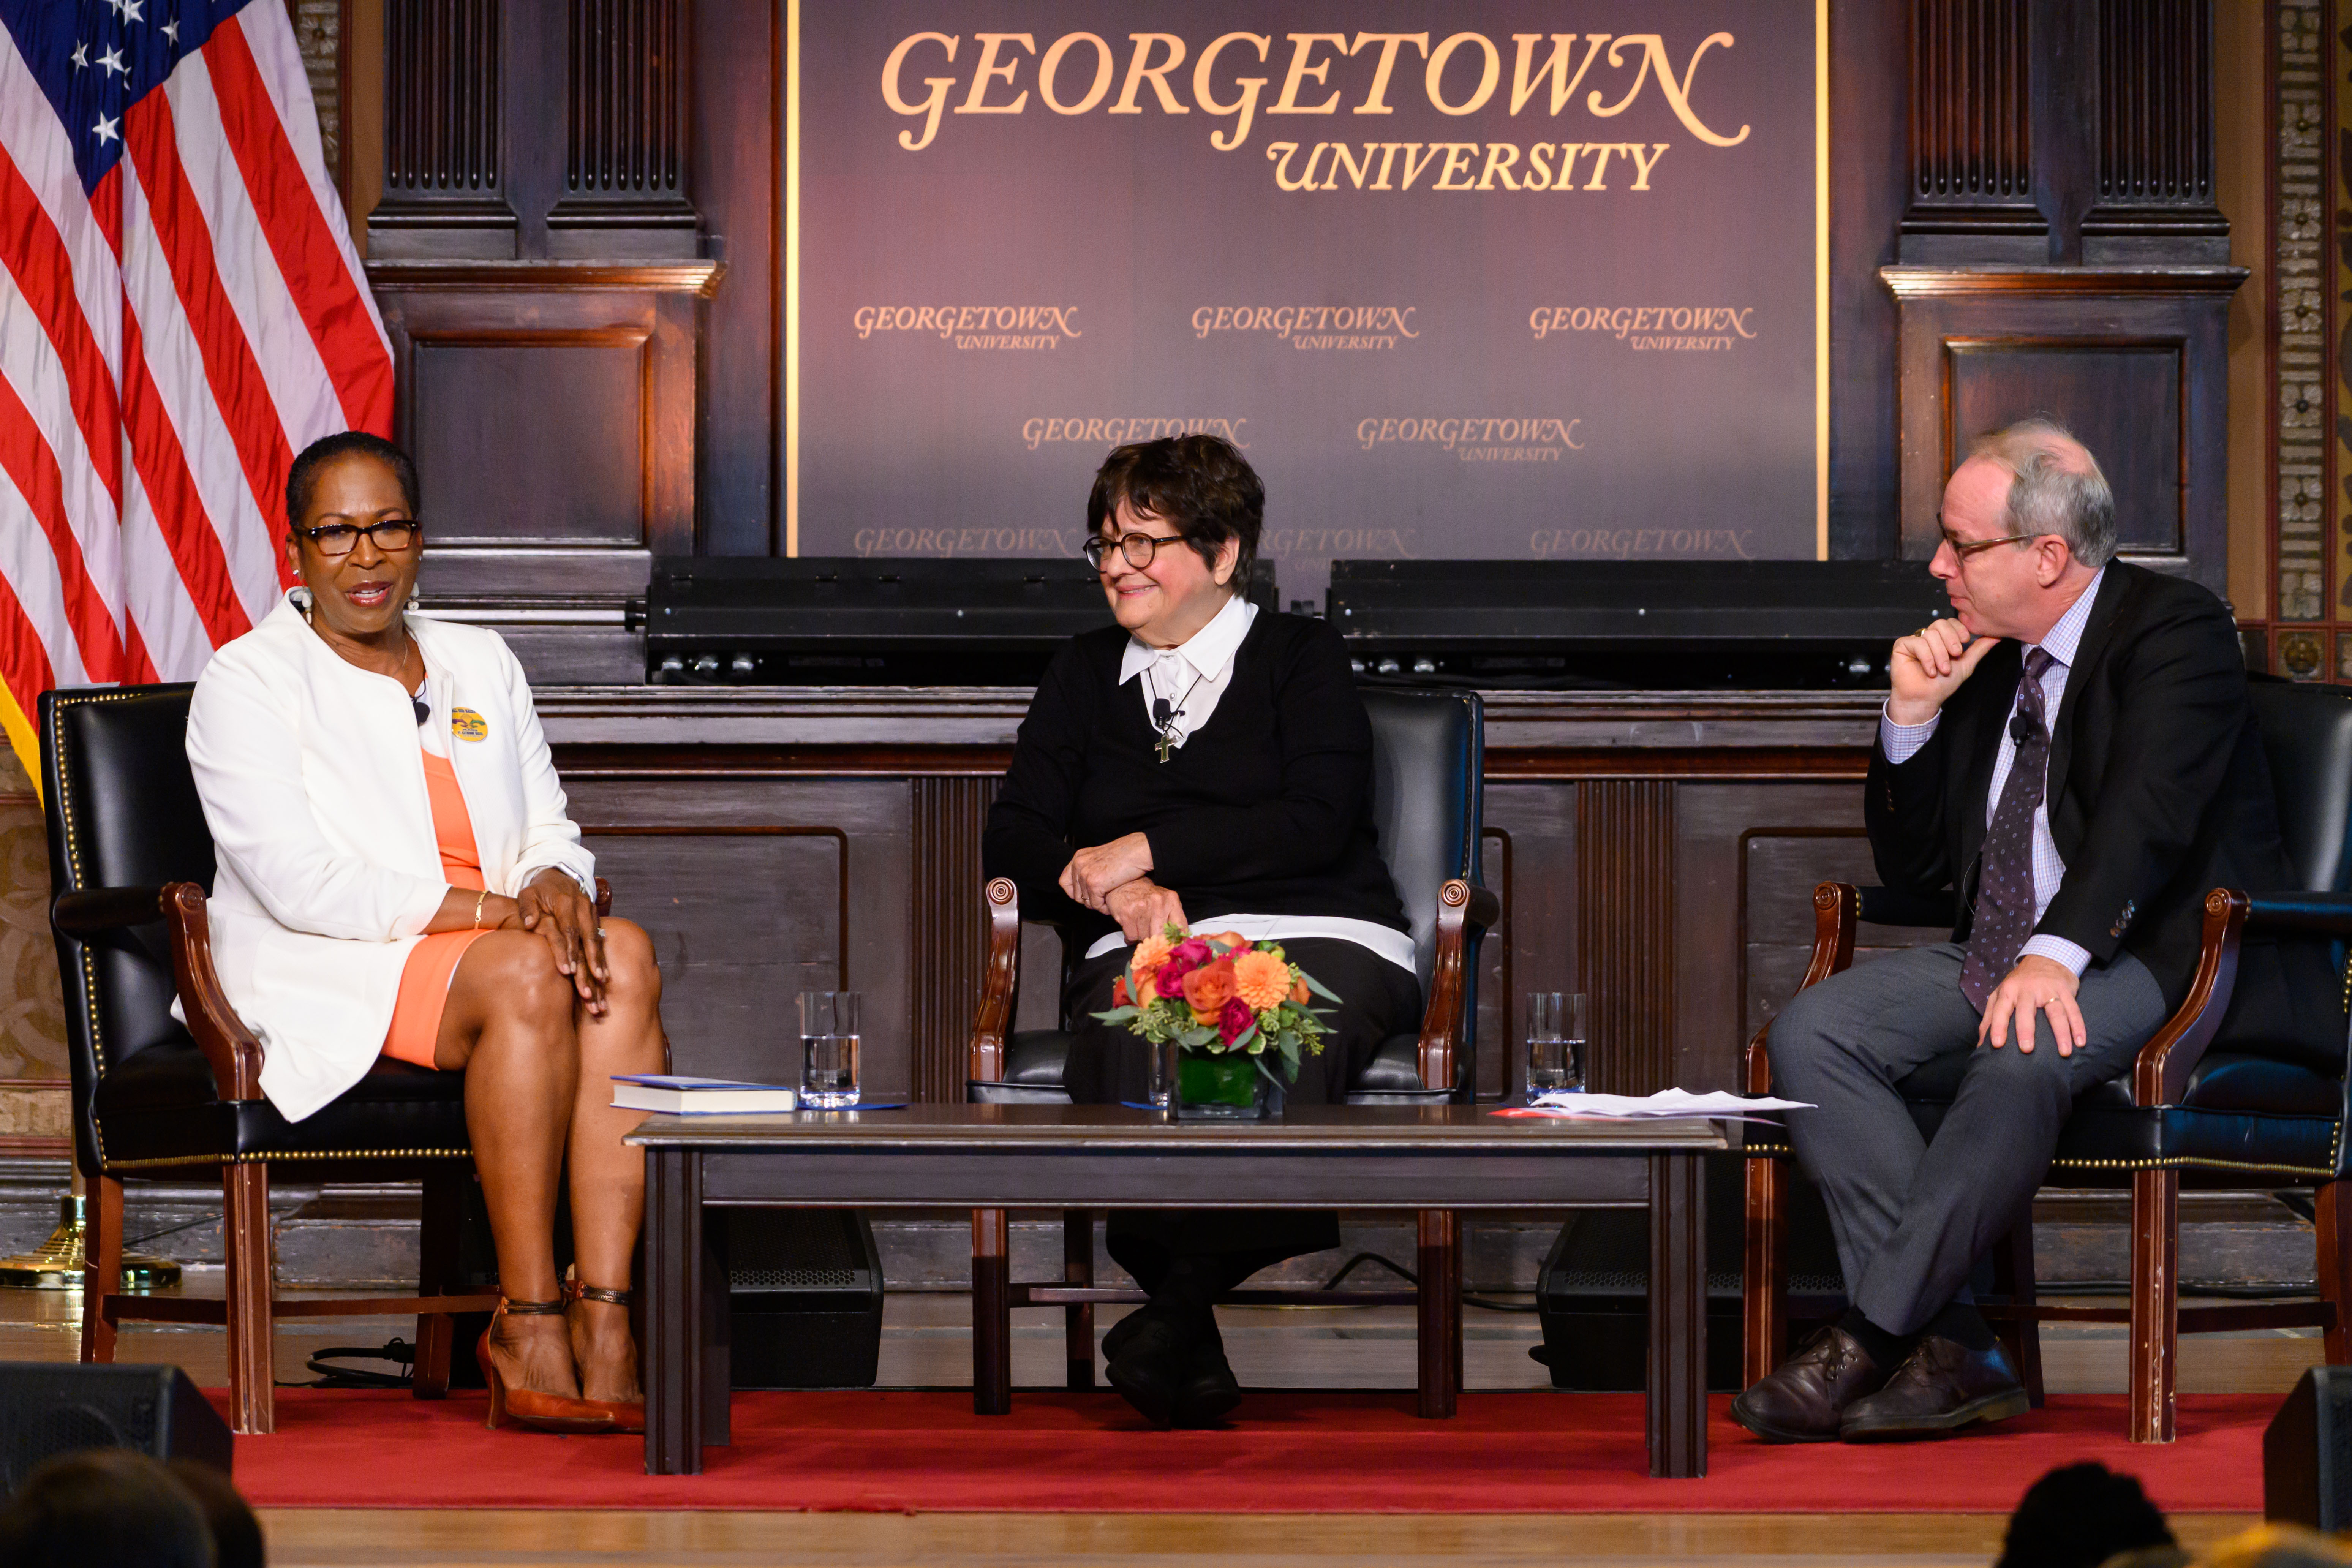 Cheryllyn Branche, Sister Helen Prejean, and Paul Elie converse in Gaston Hall.